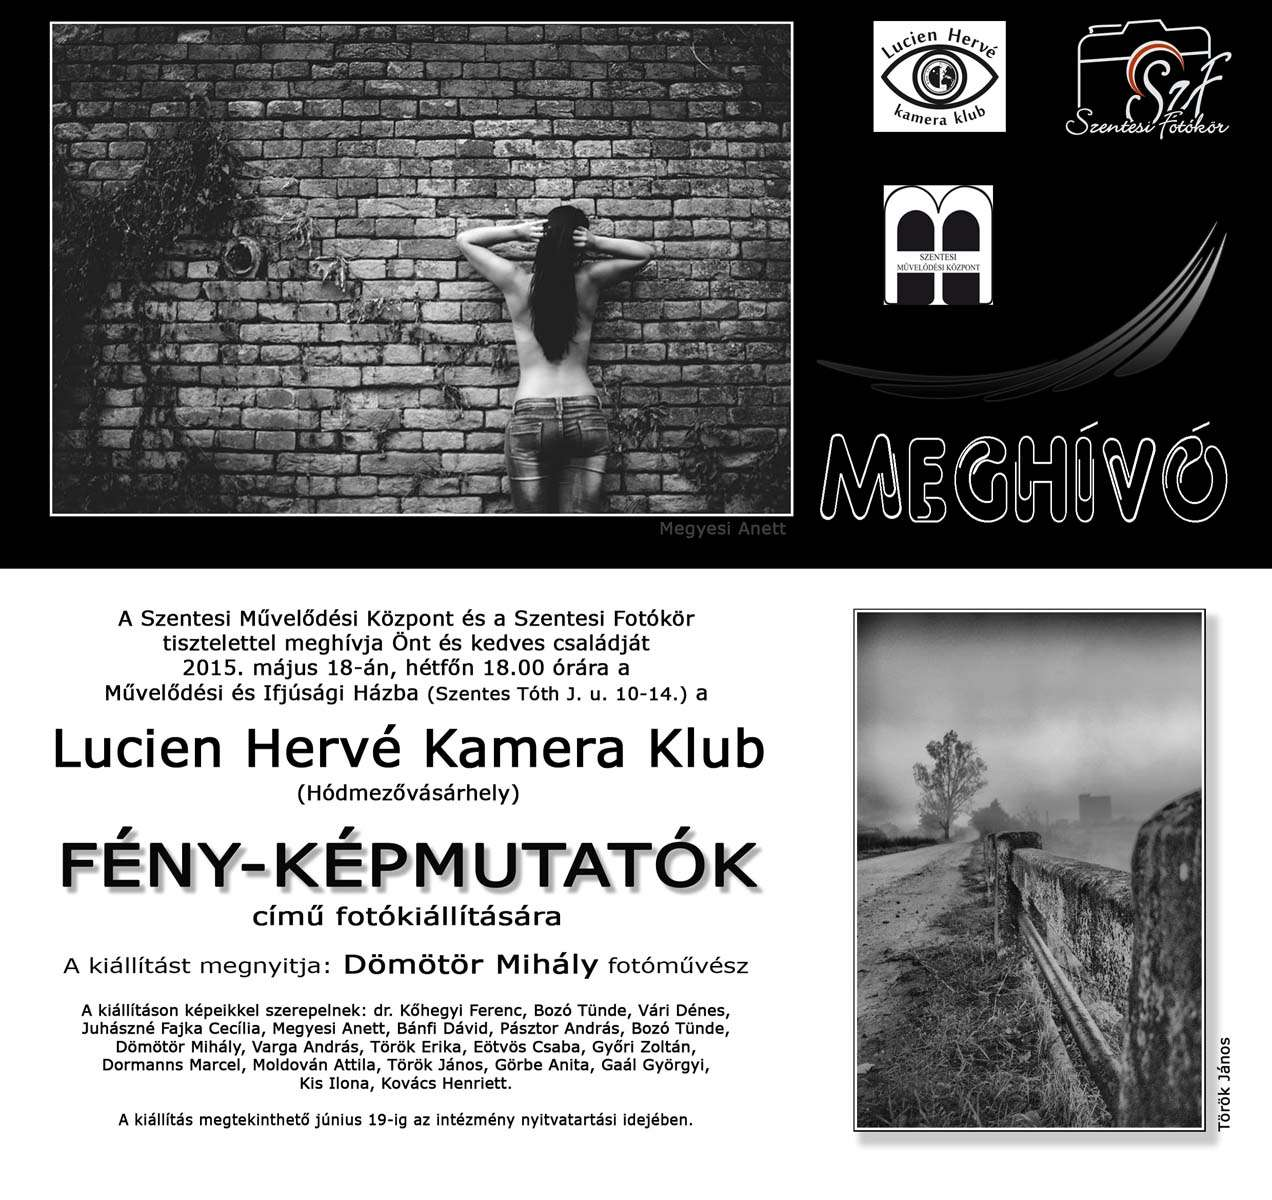 lucien_herve_kamera_klub_meghivo_szentesre_k.jpg